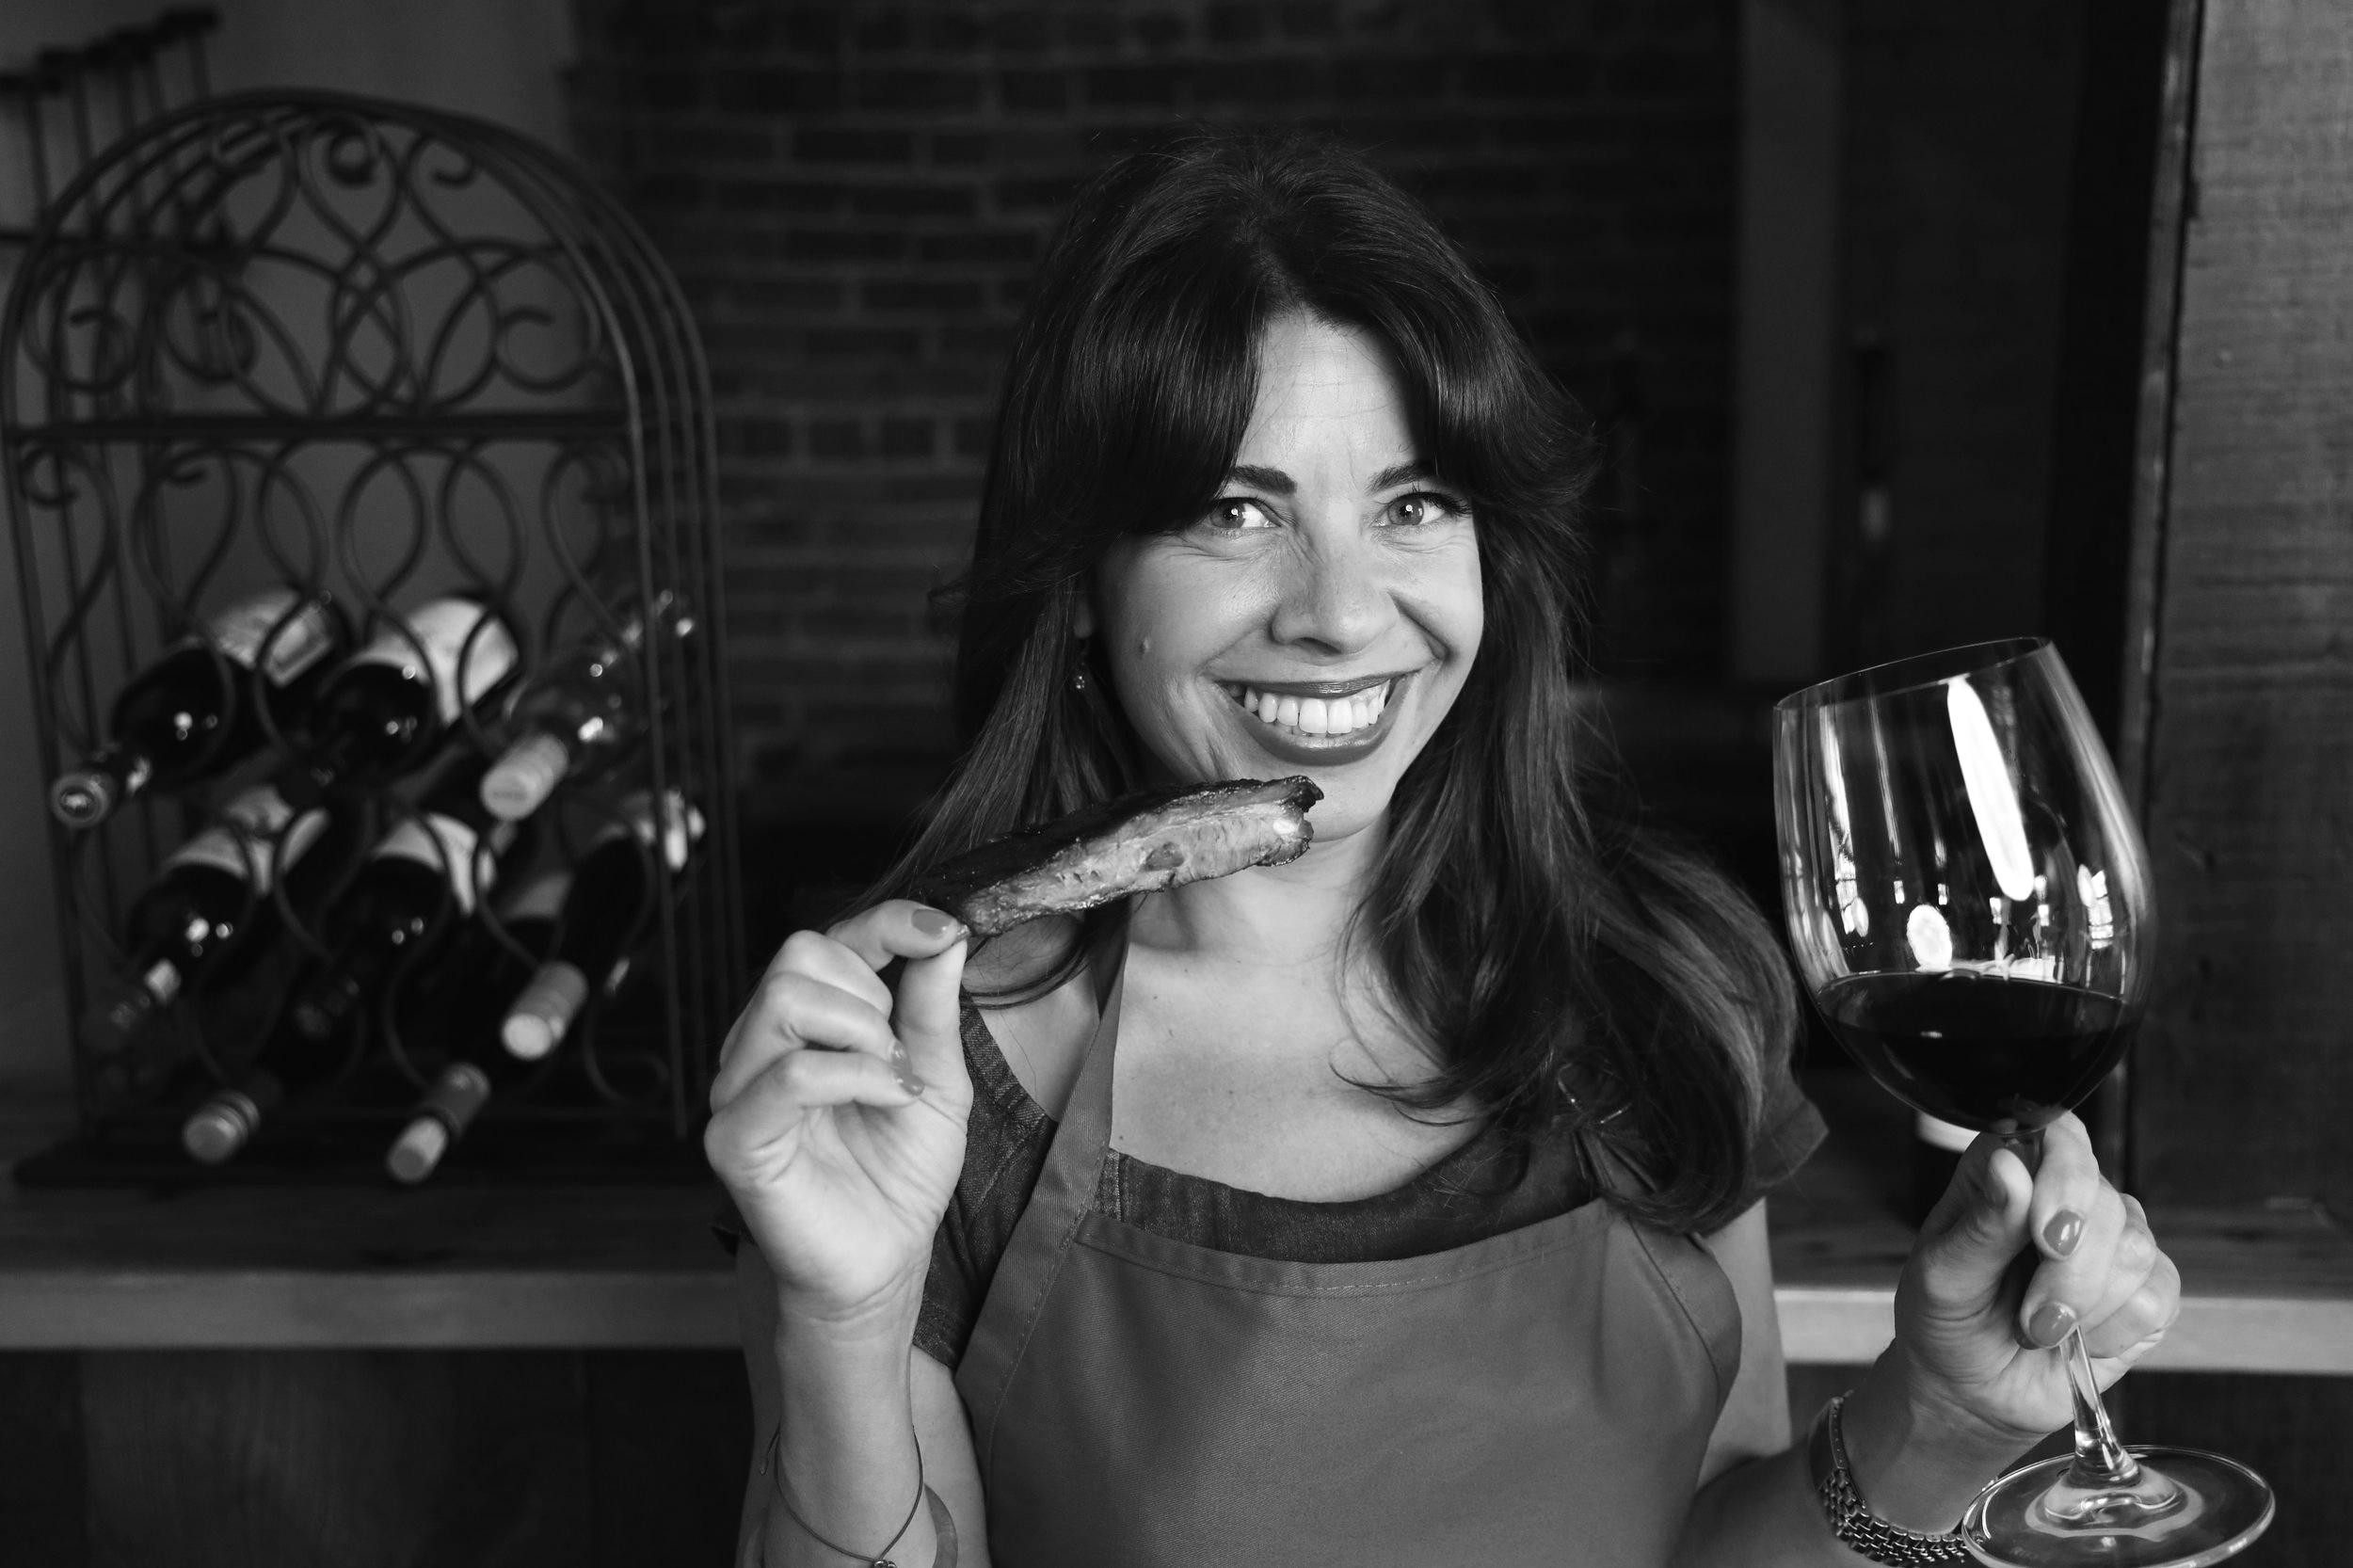 divino wine sommelier / 21 episodes (coming soon)